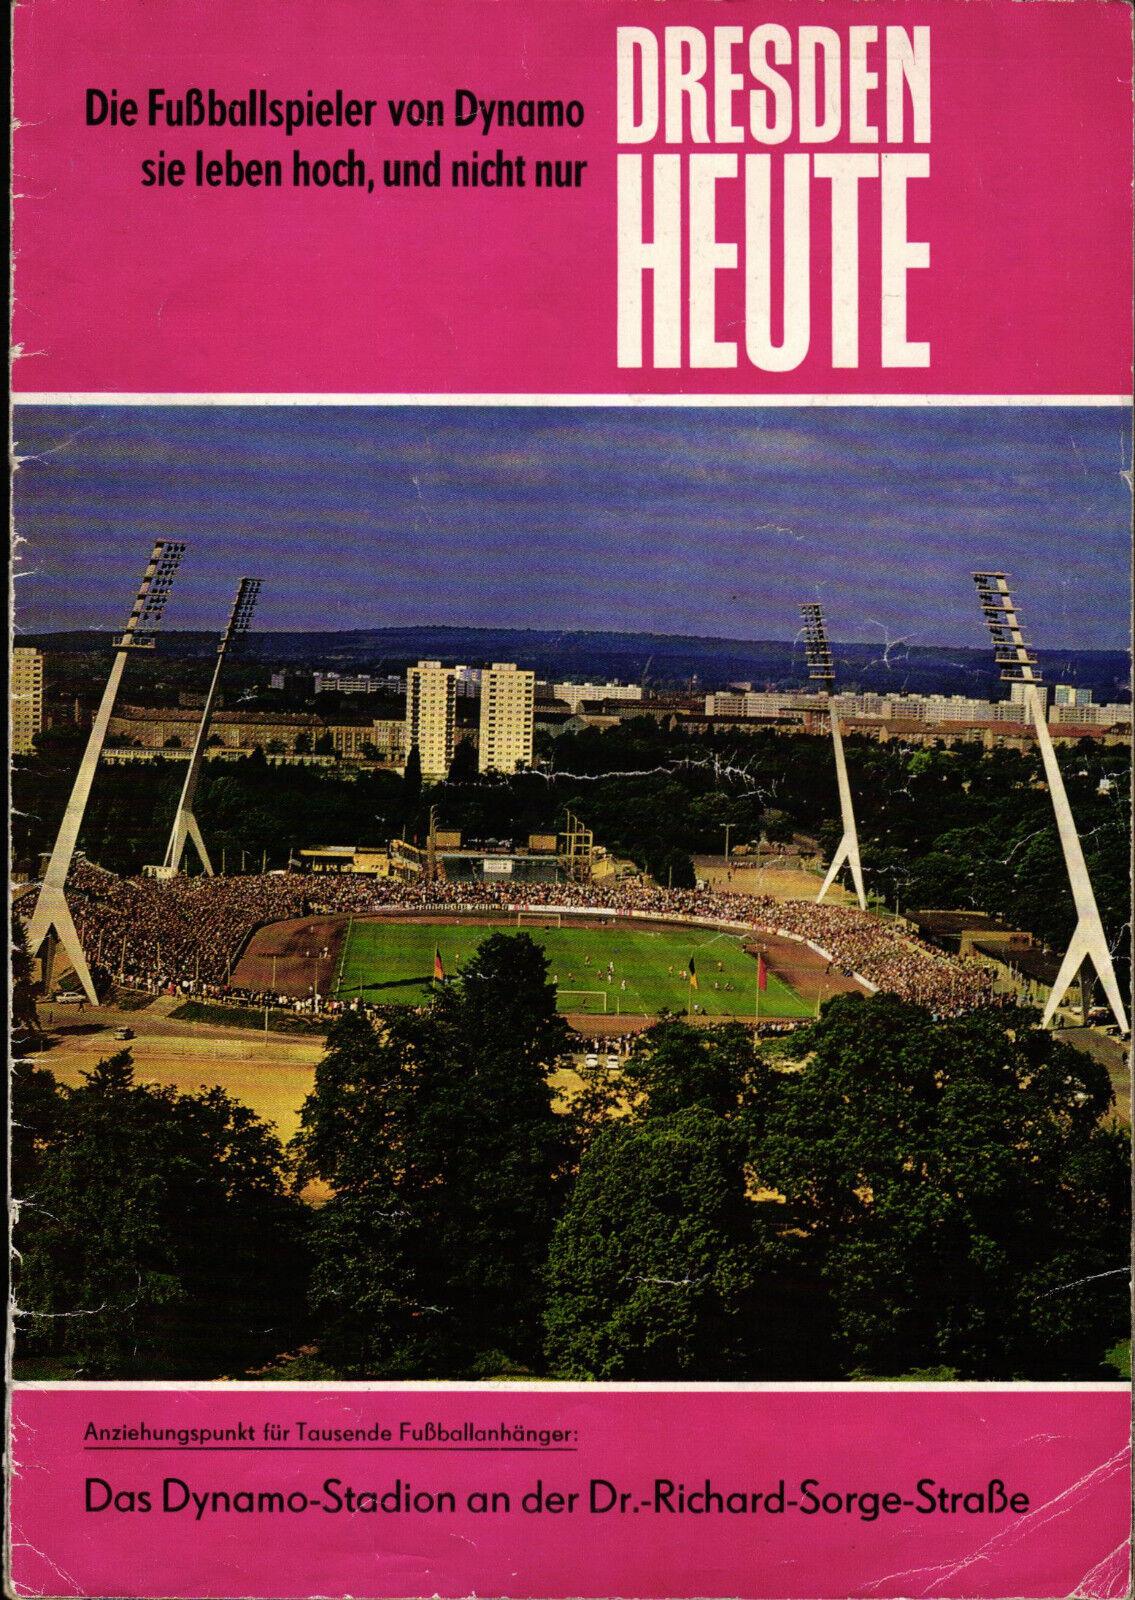 EC I 73 74 74 74 SG Dynamo Dresden - Juventus Turin, DRESDEN HEUTE 20dd67